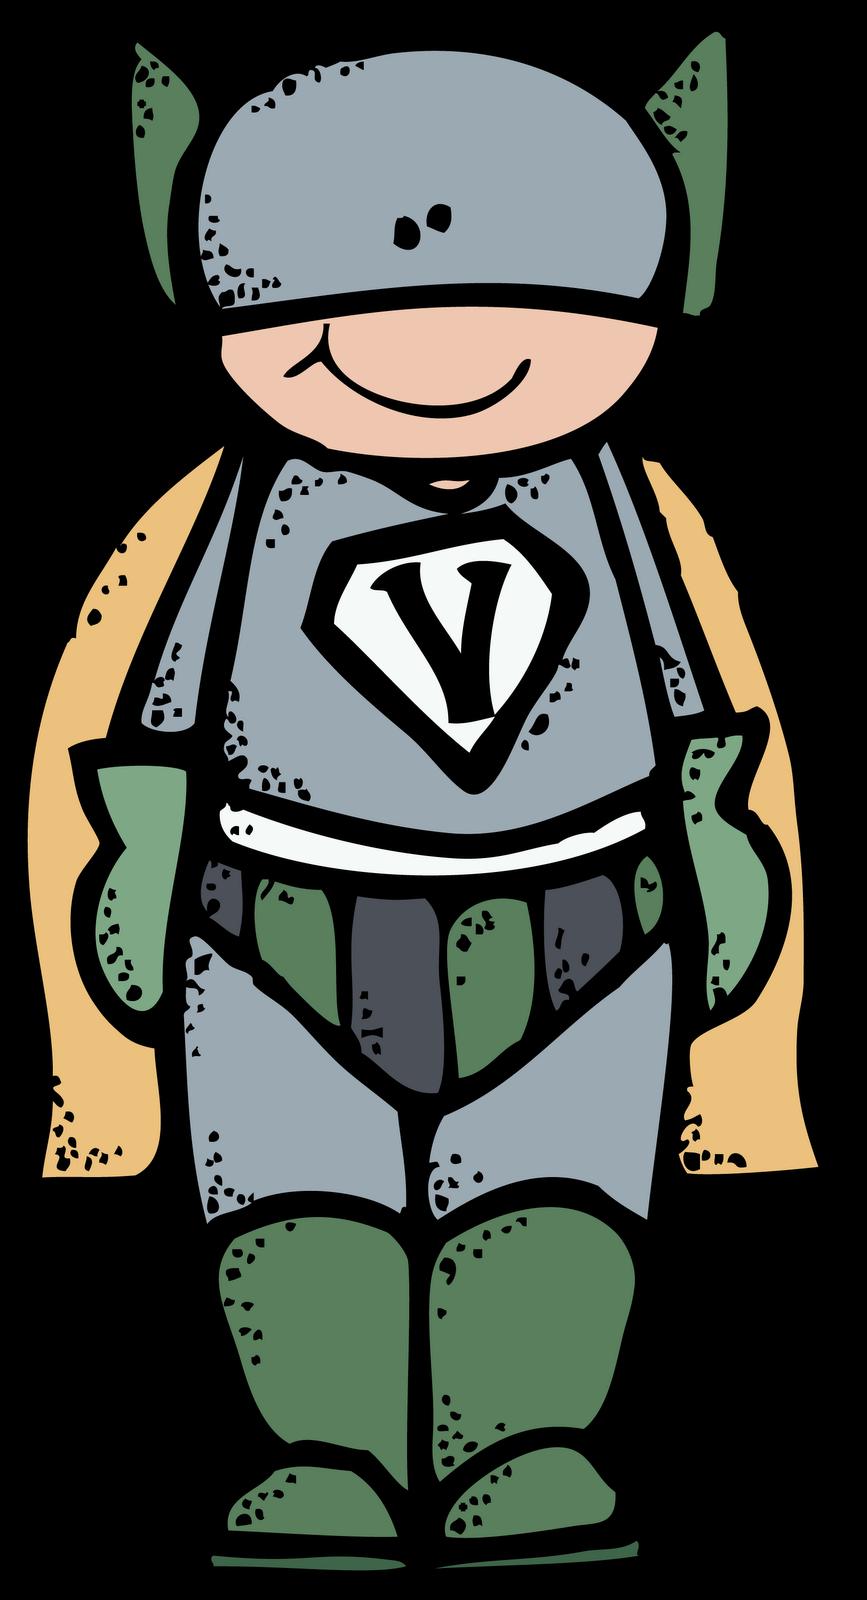 Missionary clipart valiant. Melonheadz lds illustrating kids